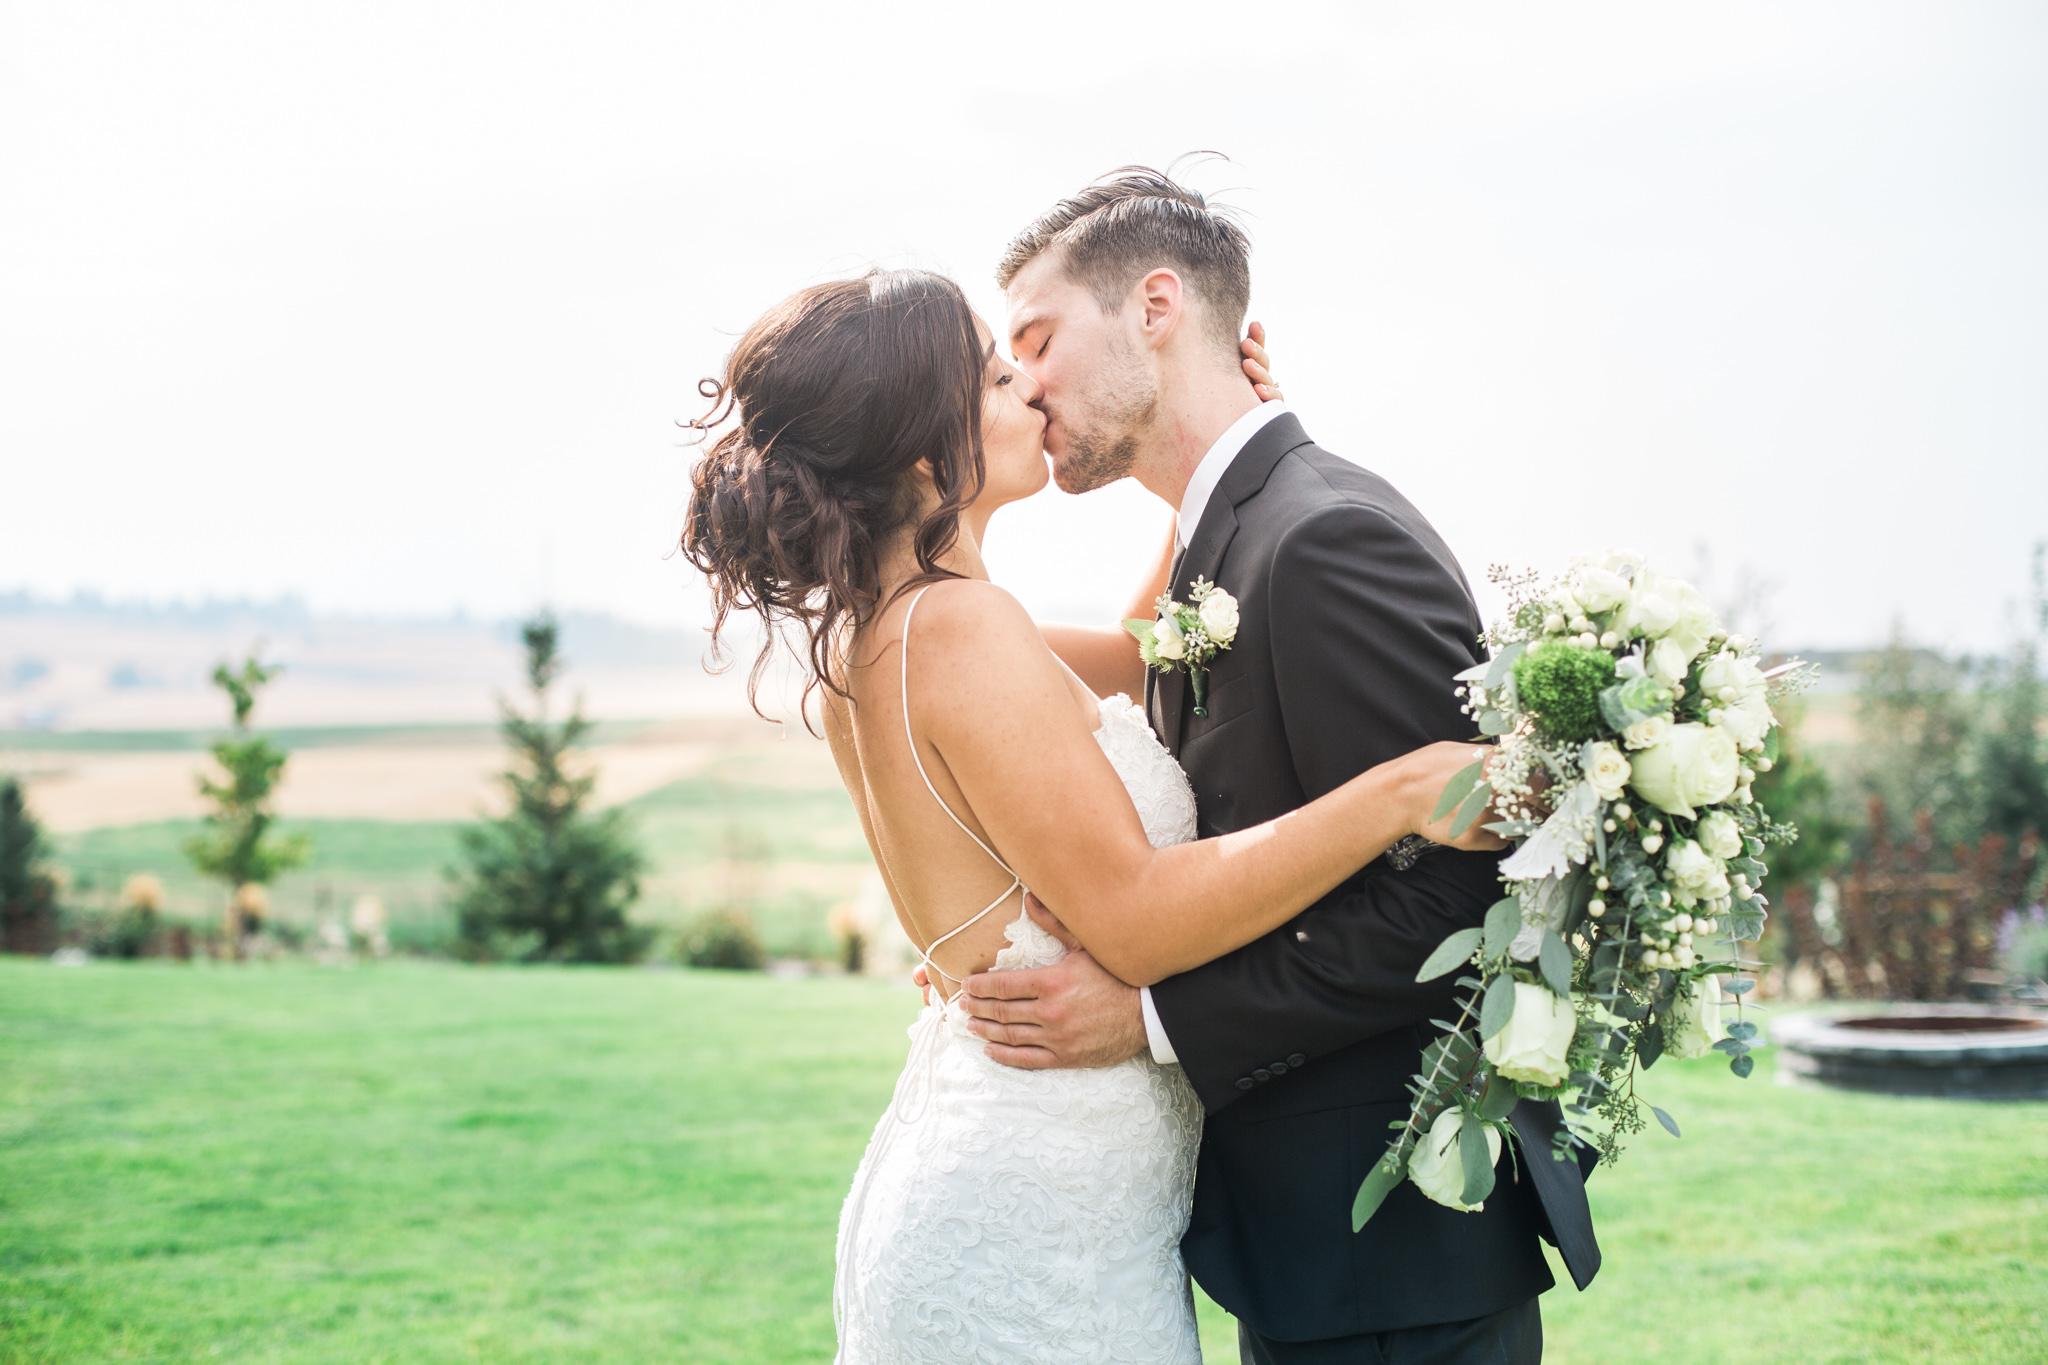 Olga_janni_wedding_090917_WEBSIZE (208 of 704).JPG